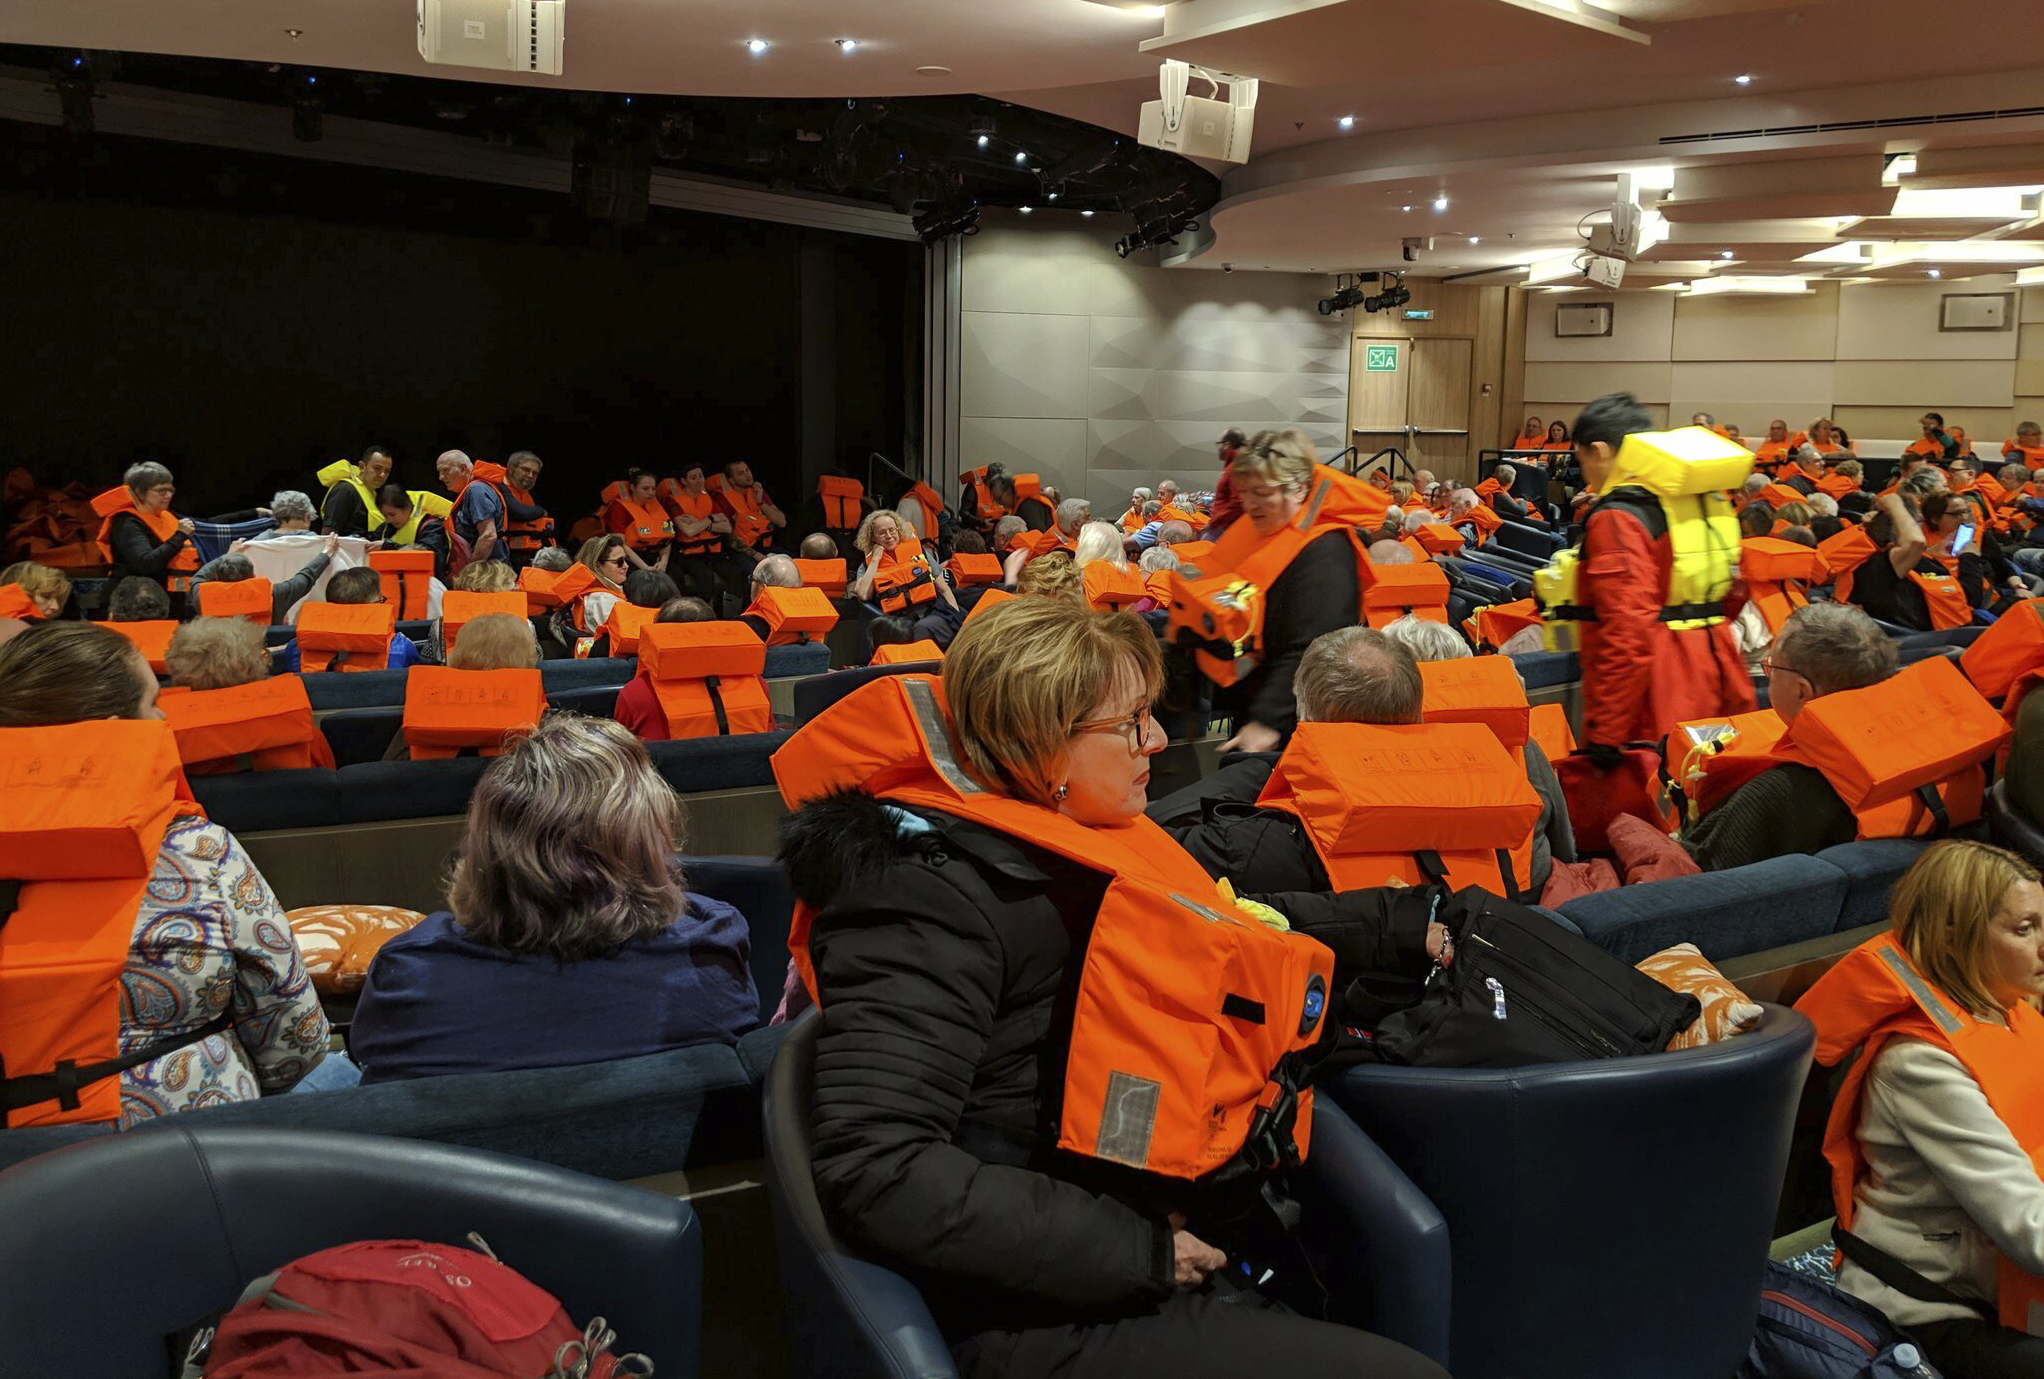 Norway_Cruise_Ship_Mayday_66106-159532.jpg14014327